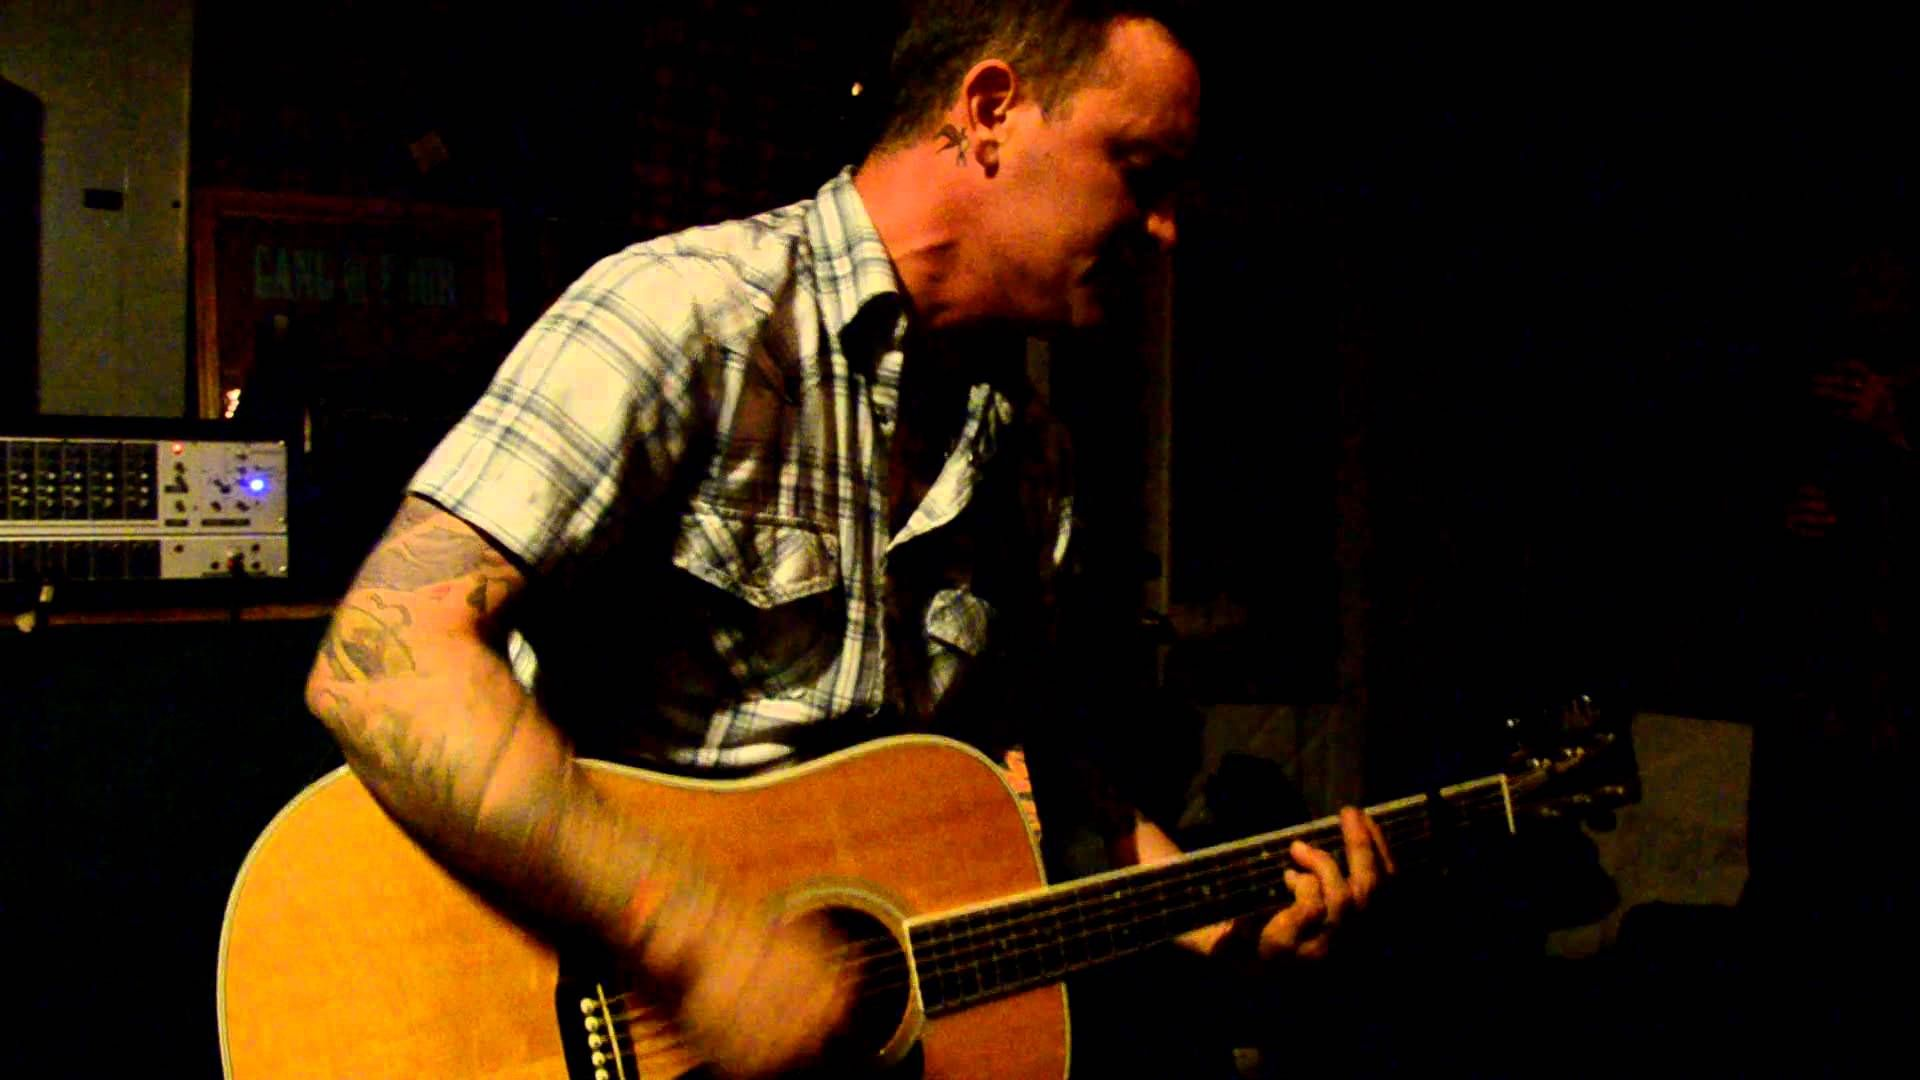 Dave Hause Jane Music Covers Music Lyrics